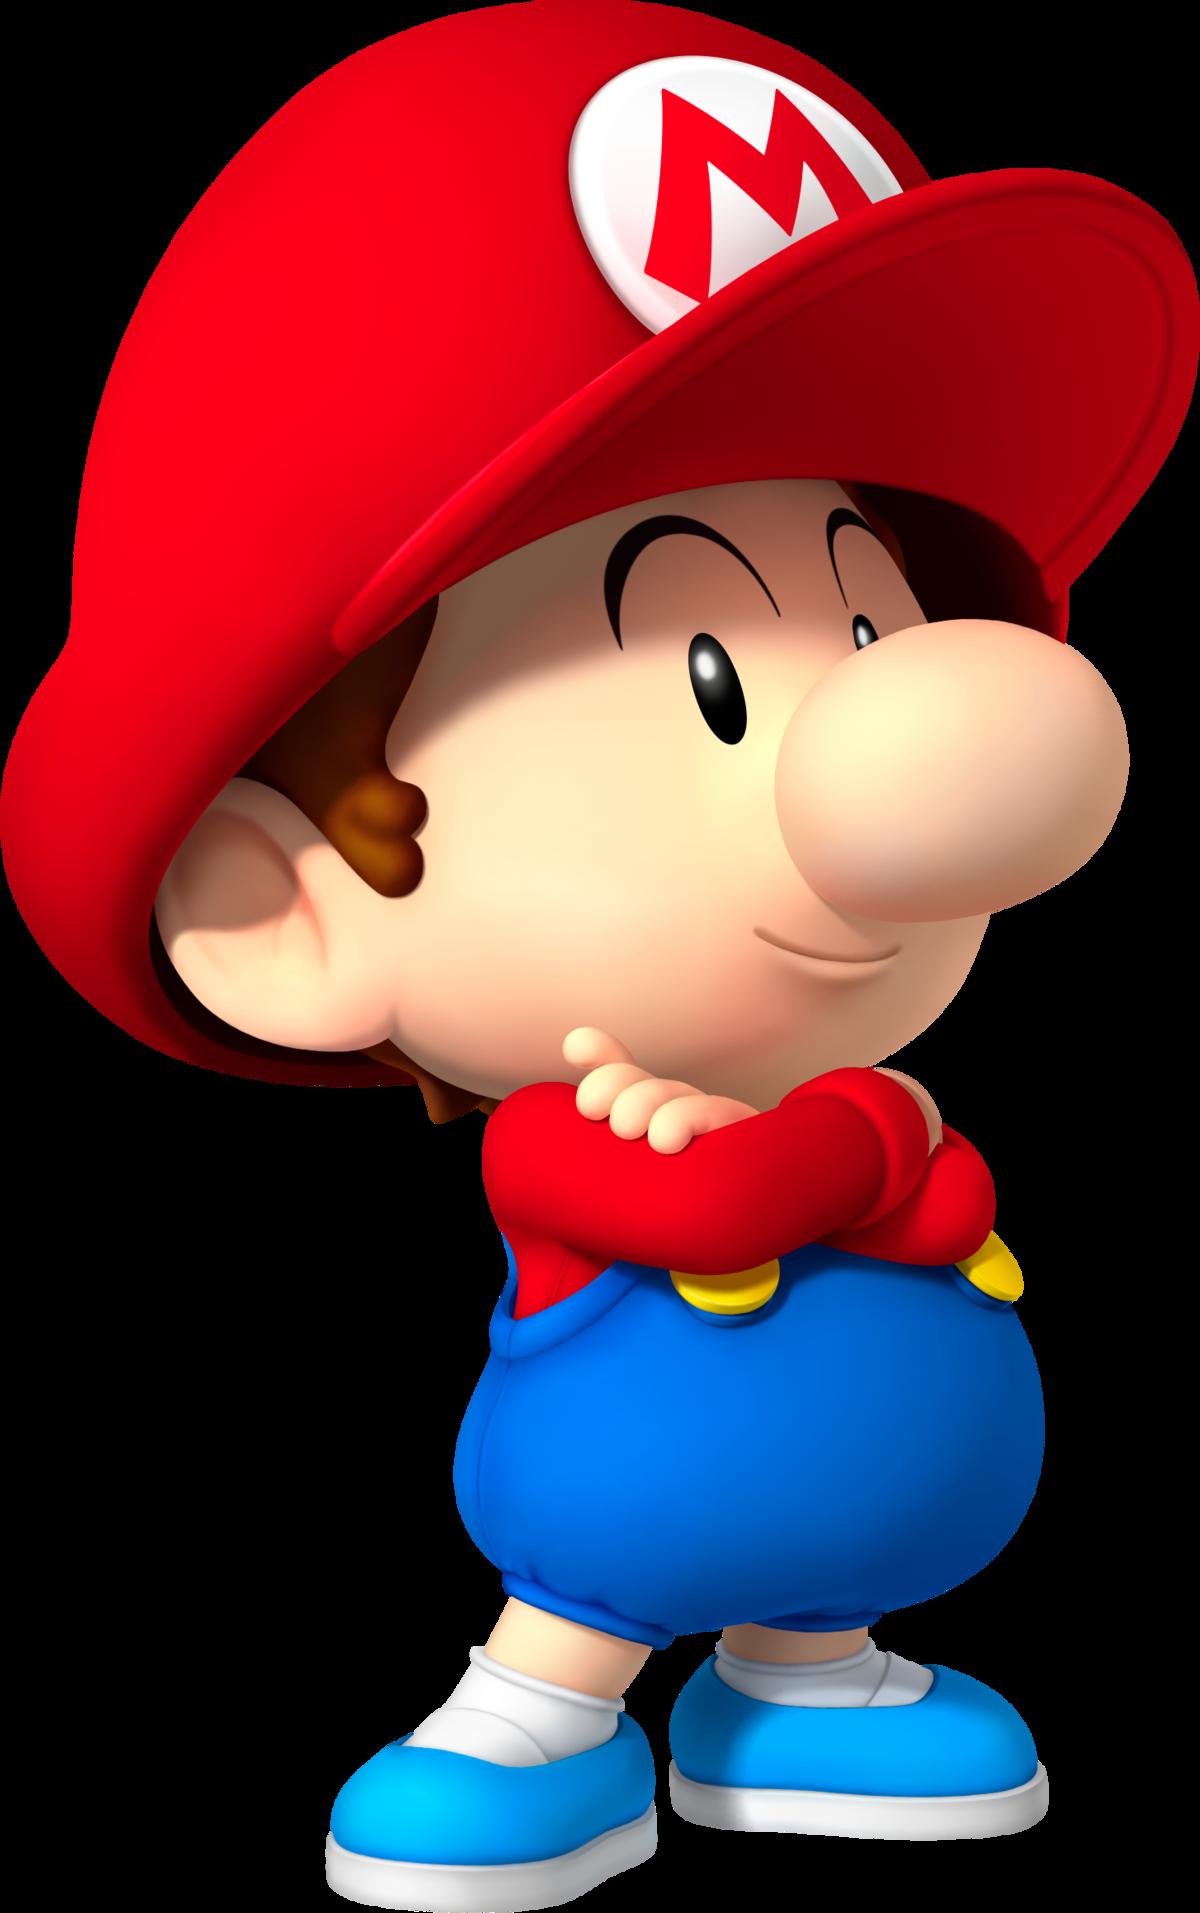 Mario Kart Asteroid